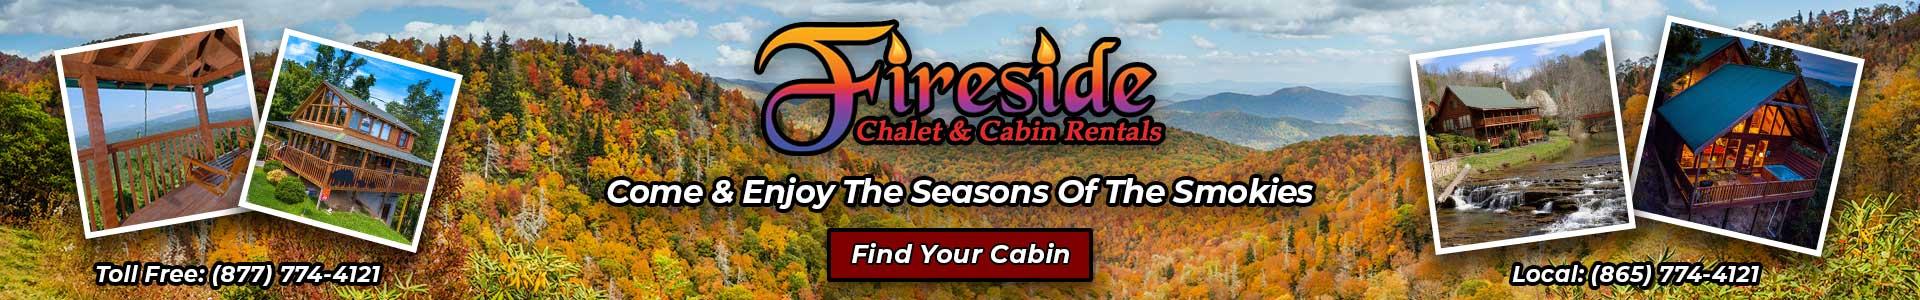 Ad - Fireside Chalets